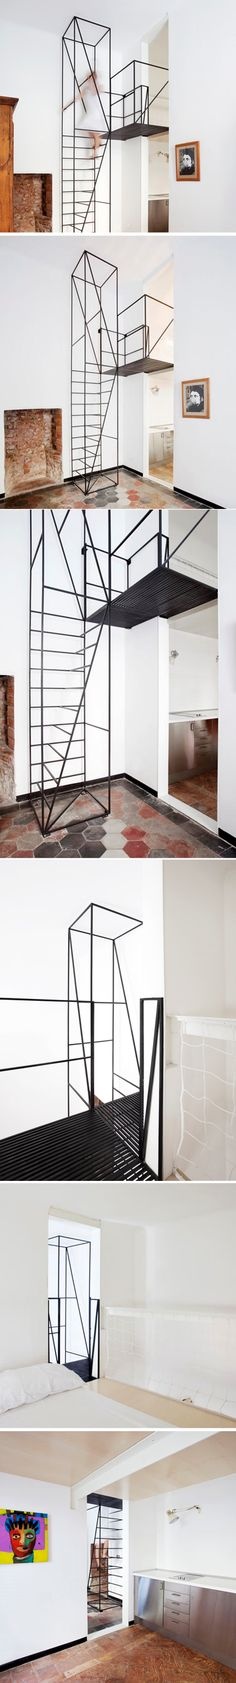 http://www.dezeen.com/2012/09/05/metal-staircase-by-francesco-librizzi-studio/